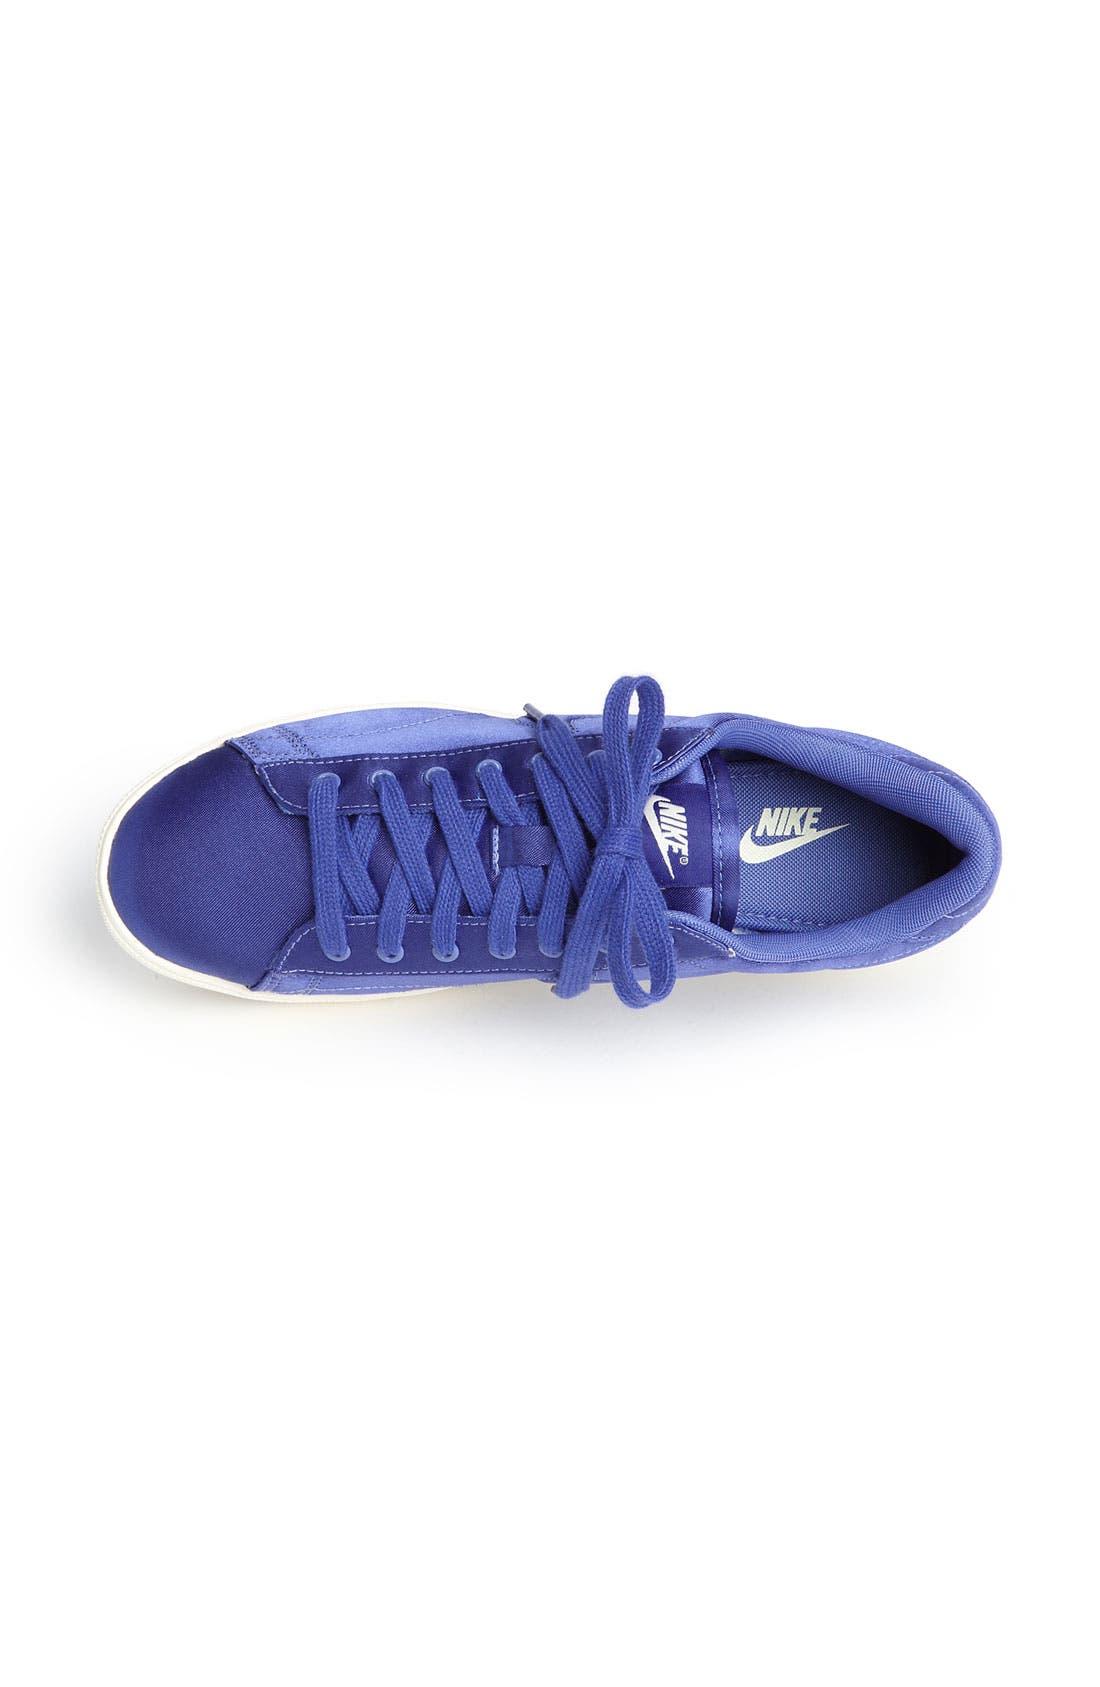 Alternate Image 3  - Nike 'Racquette' Sneaker (Women)